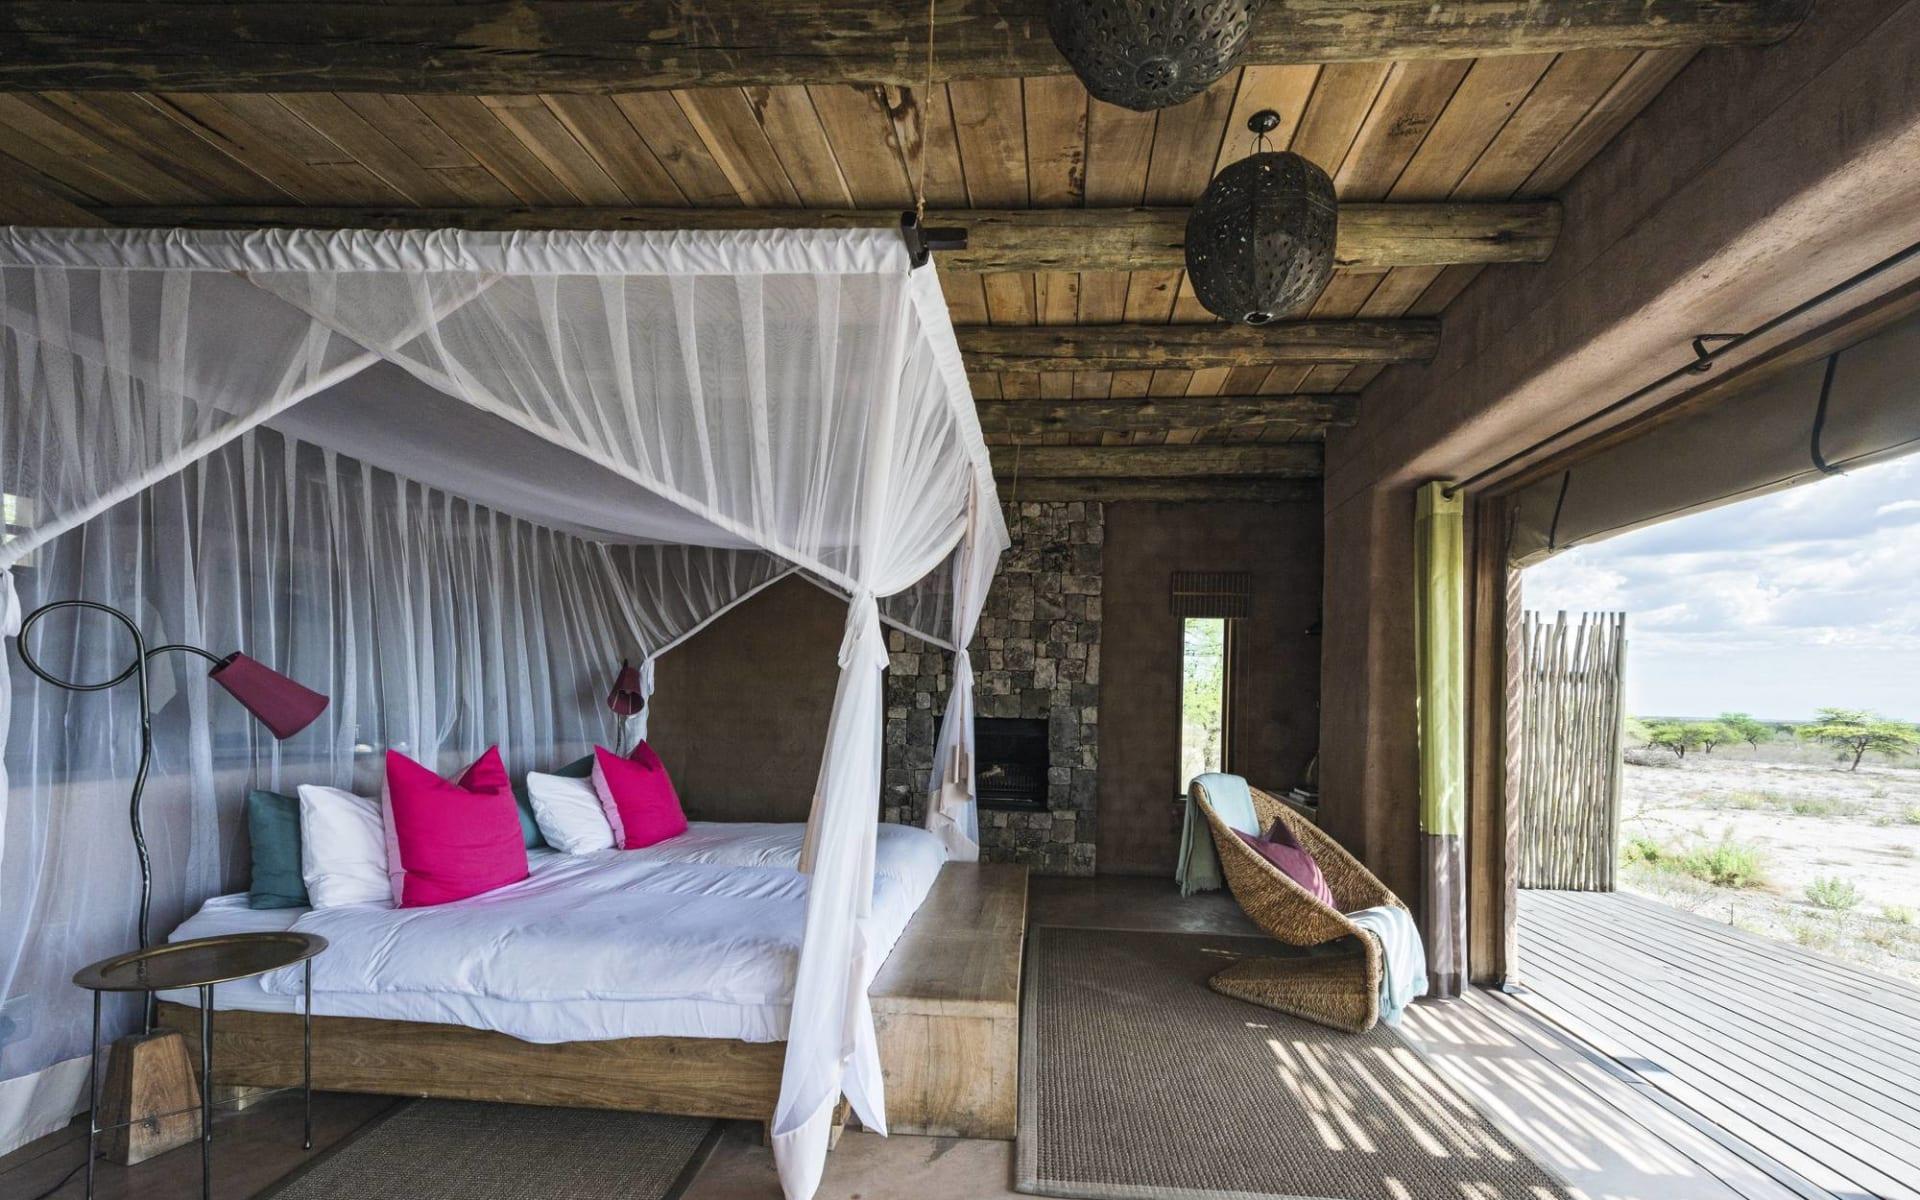 Onguma The Fort in Etosha Nationalpark: zimmer Onguma The Fort - Zimmer mit Bett und Aussicht